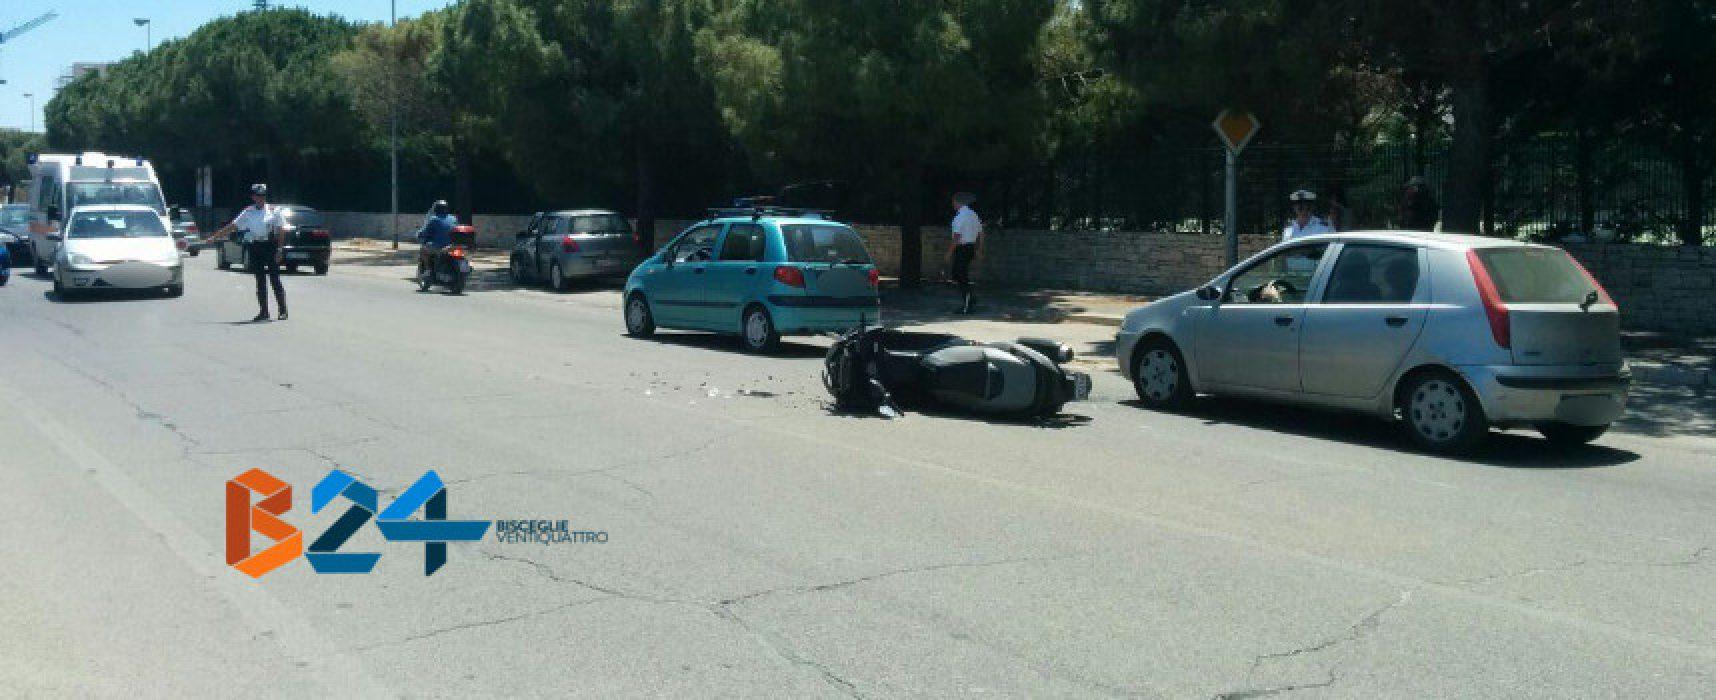 Scontro auto-moto su via Bovio, 21enne al pronto soccorso